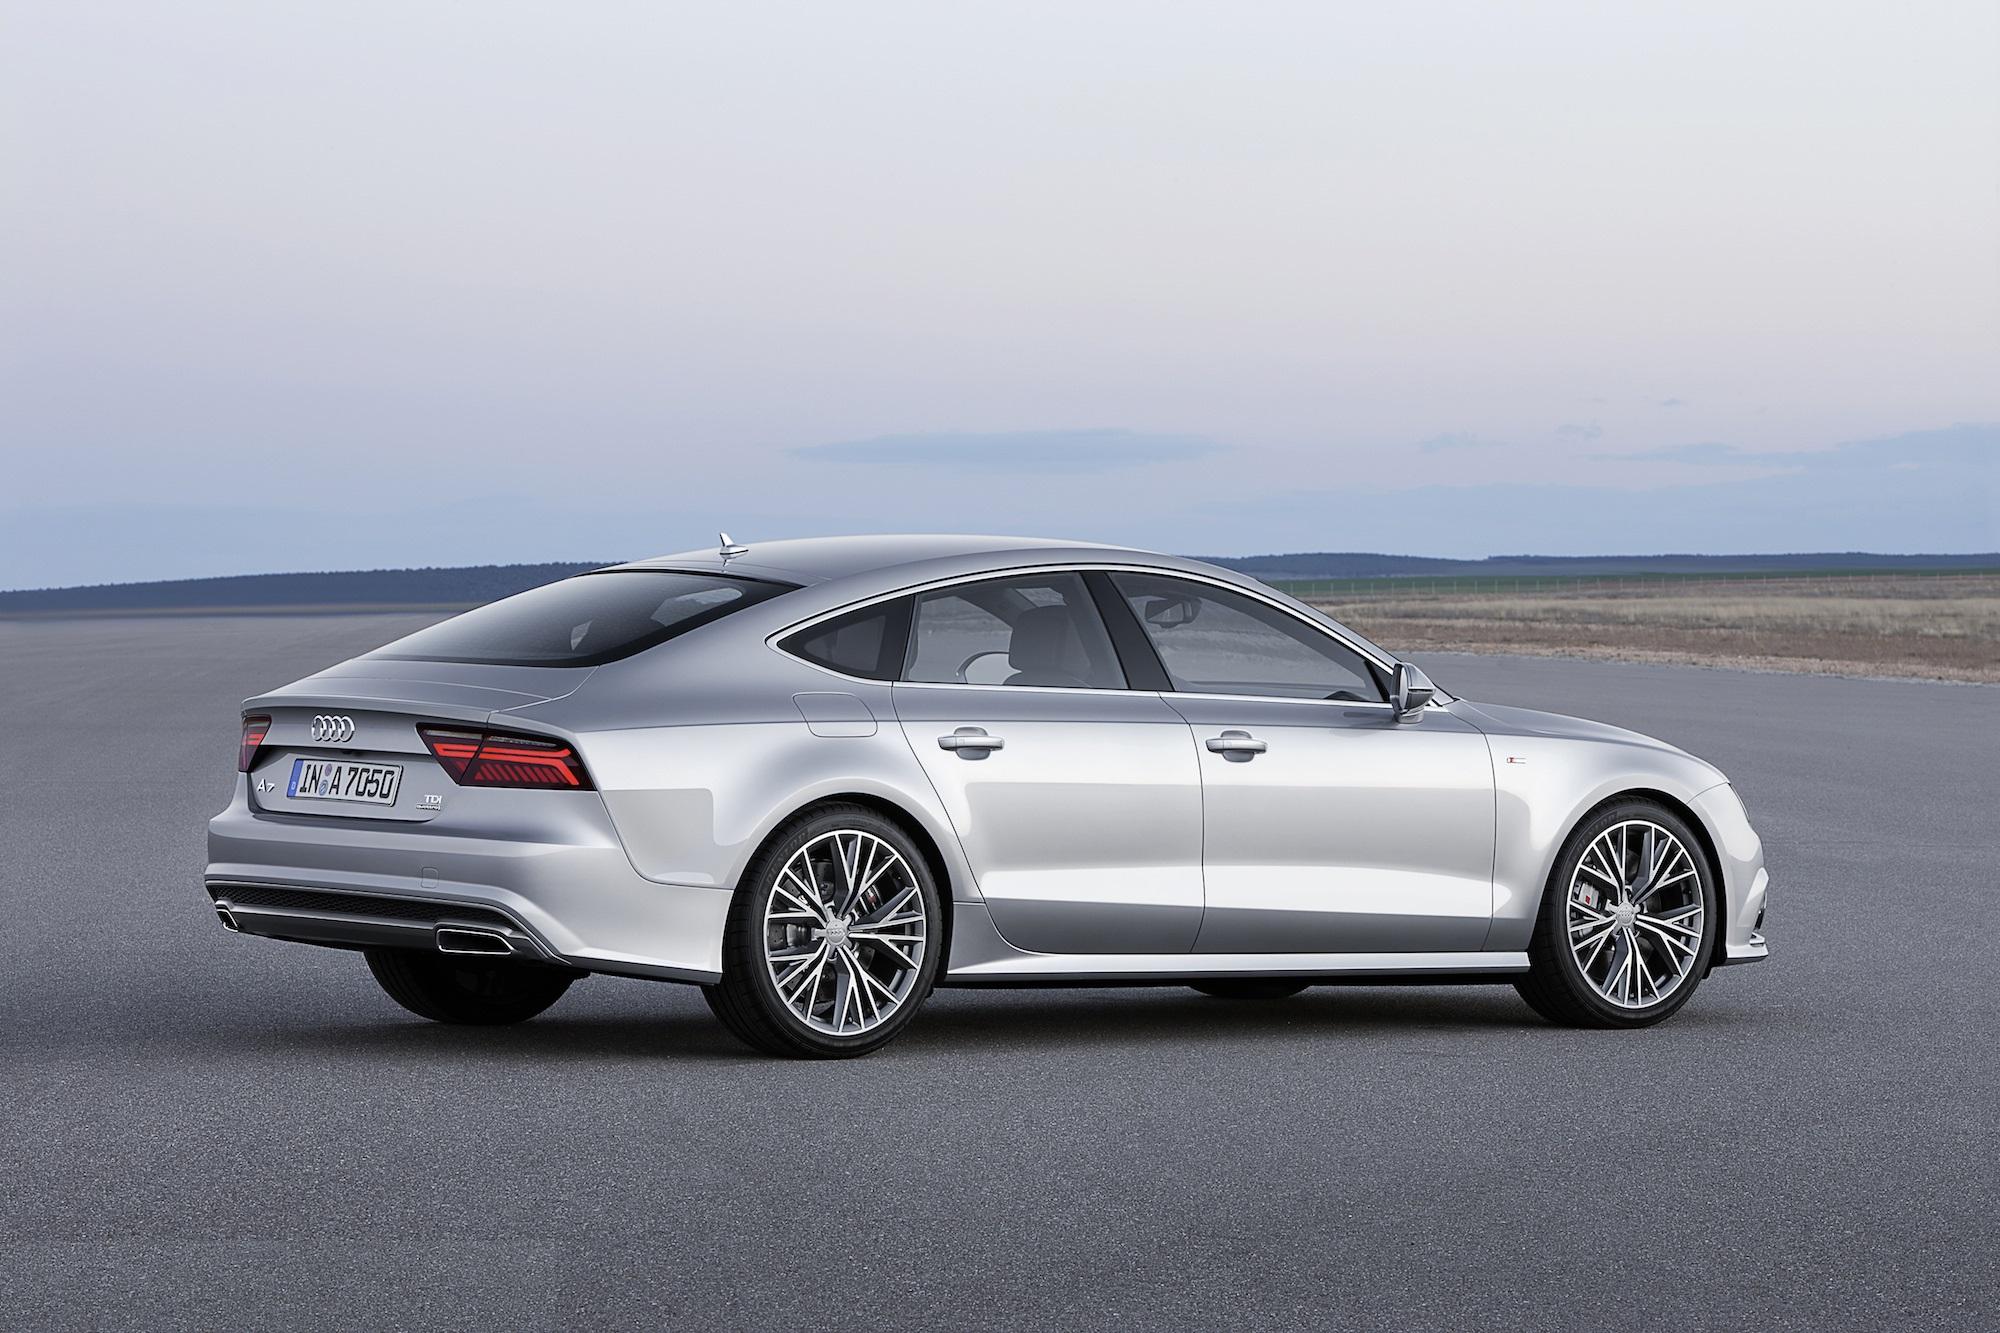 Audi A7 Quattro Lease Deals Car Reviews 2018